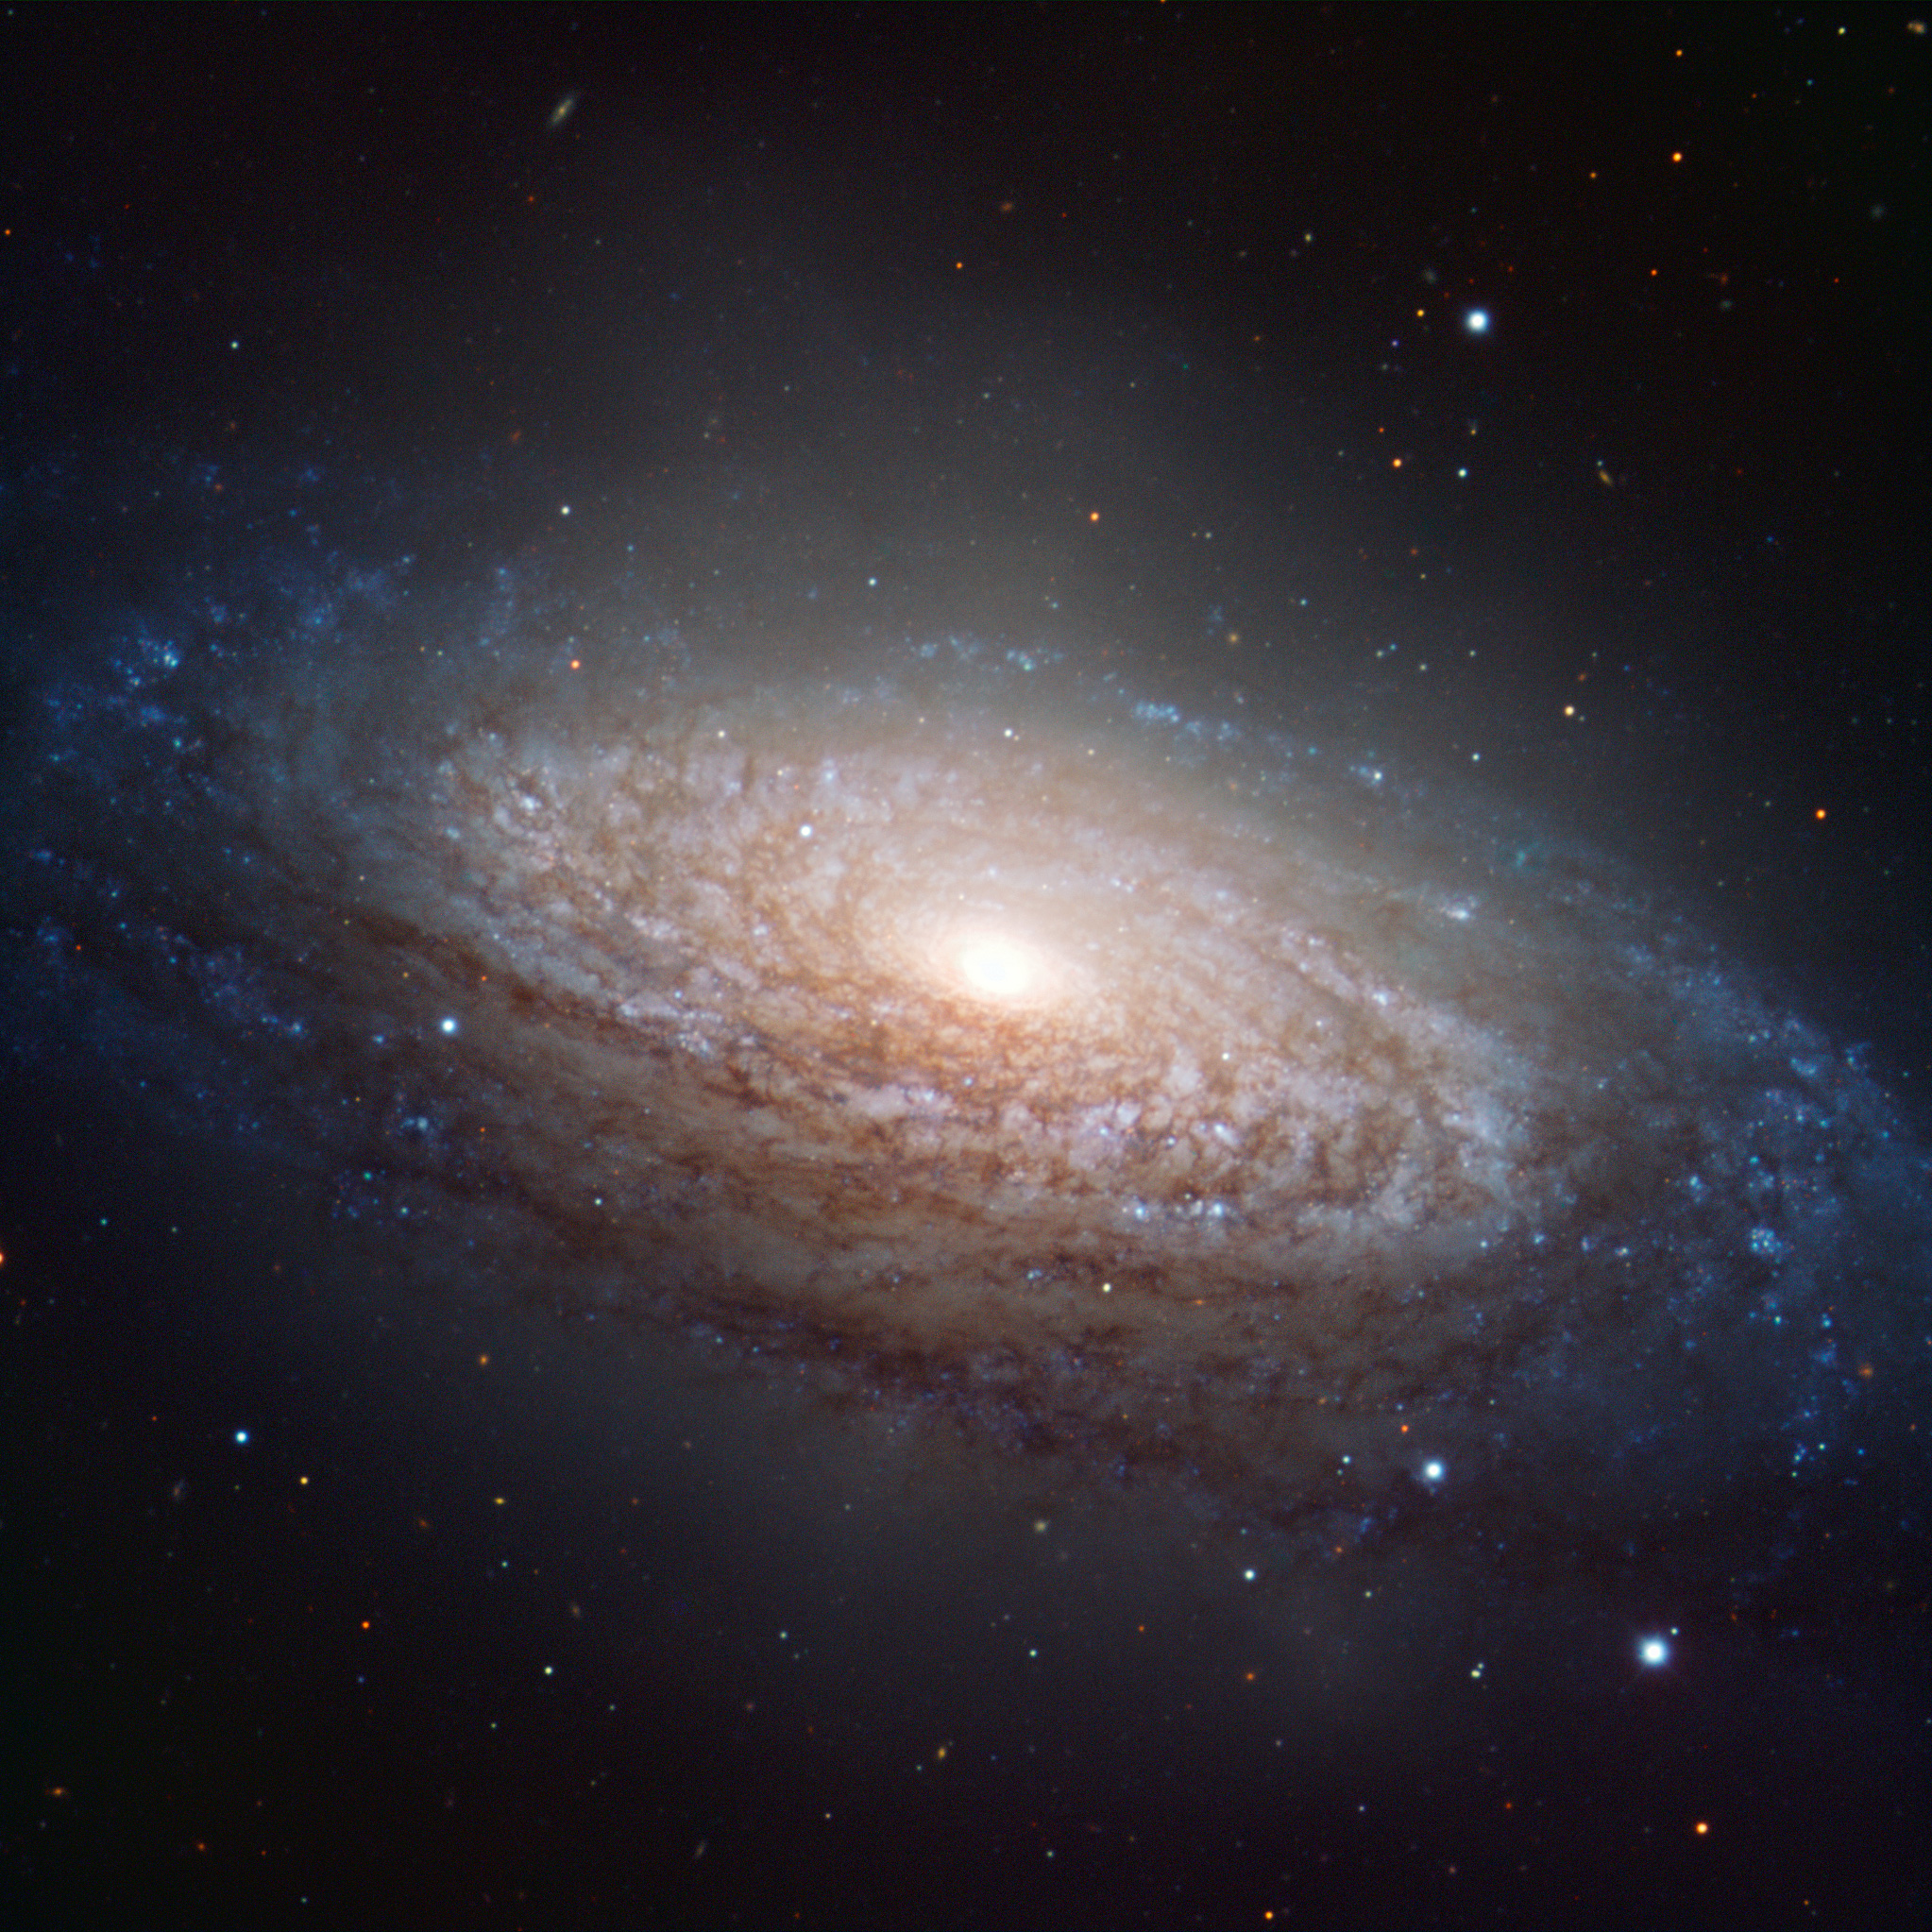 NGC3521-eso1129a.jpg